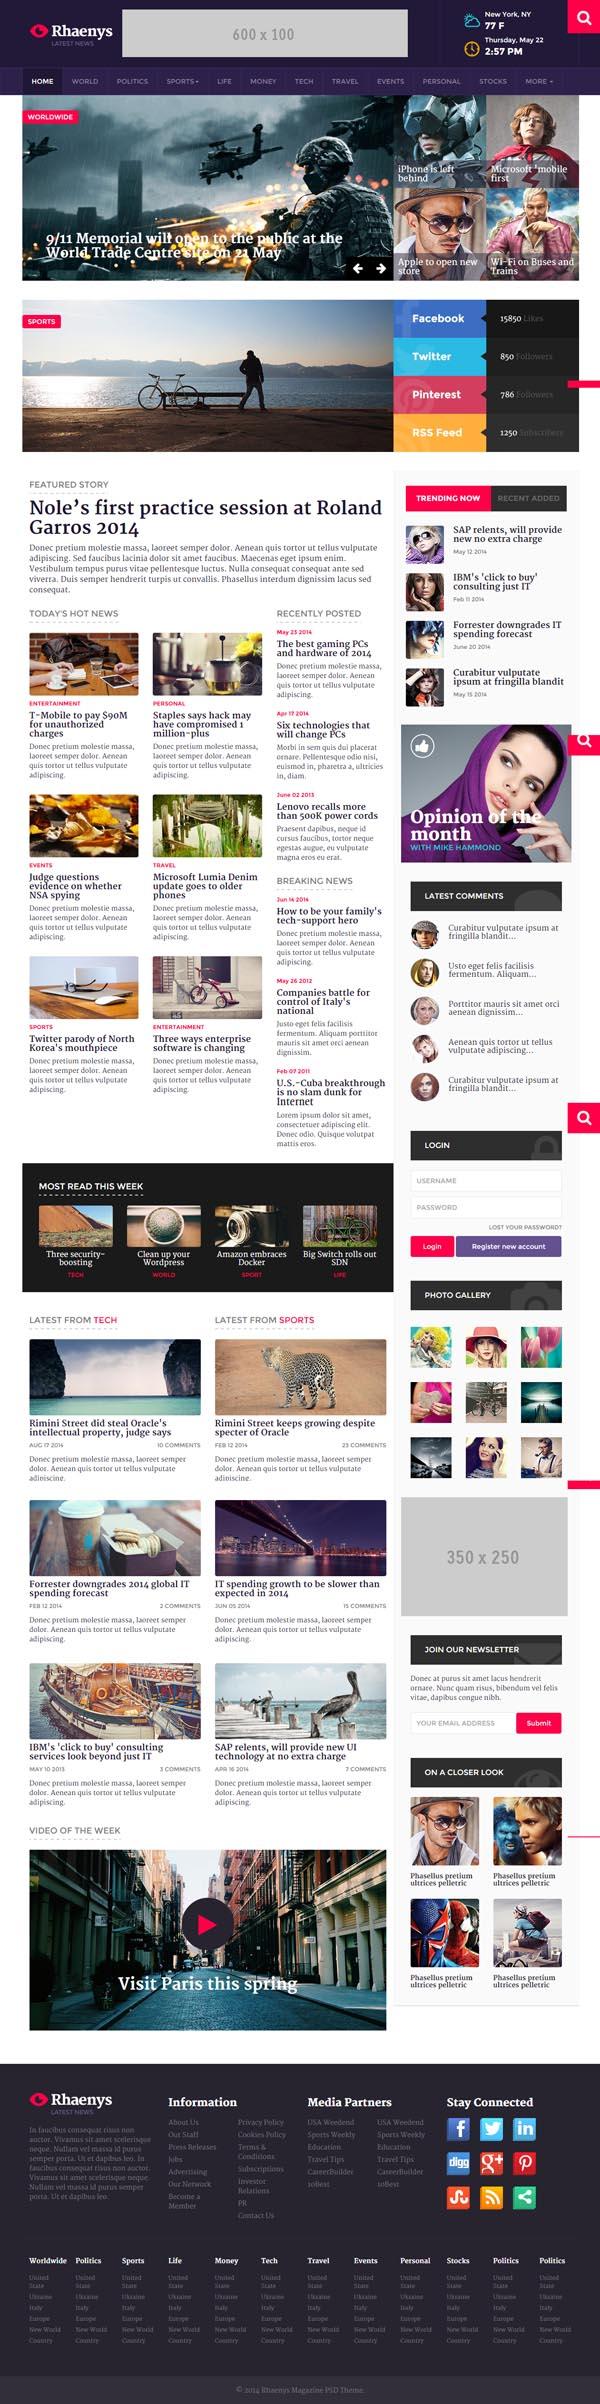 Rhaenys - Magazine / News Responsive Template